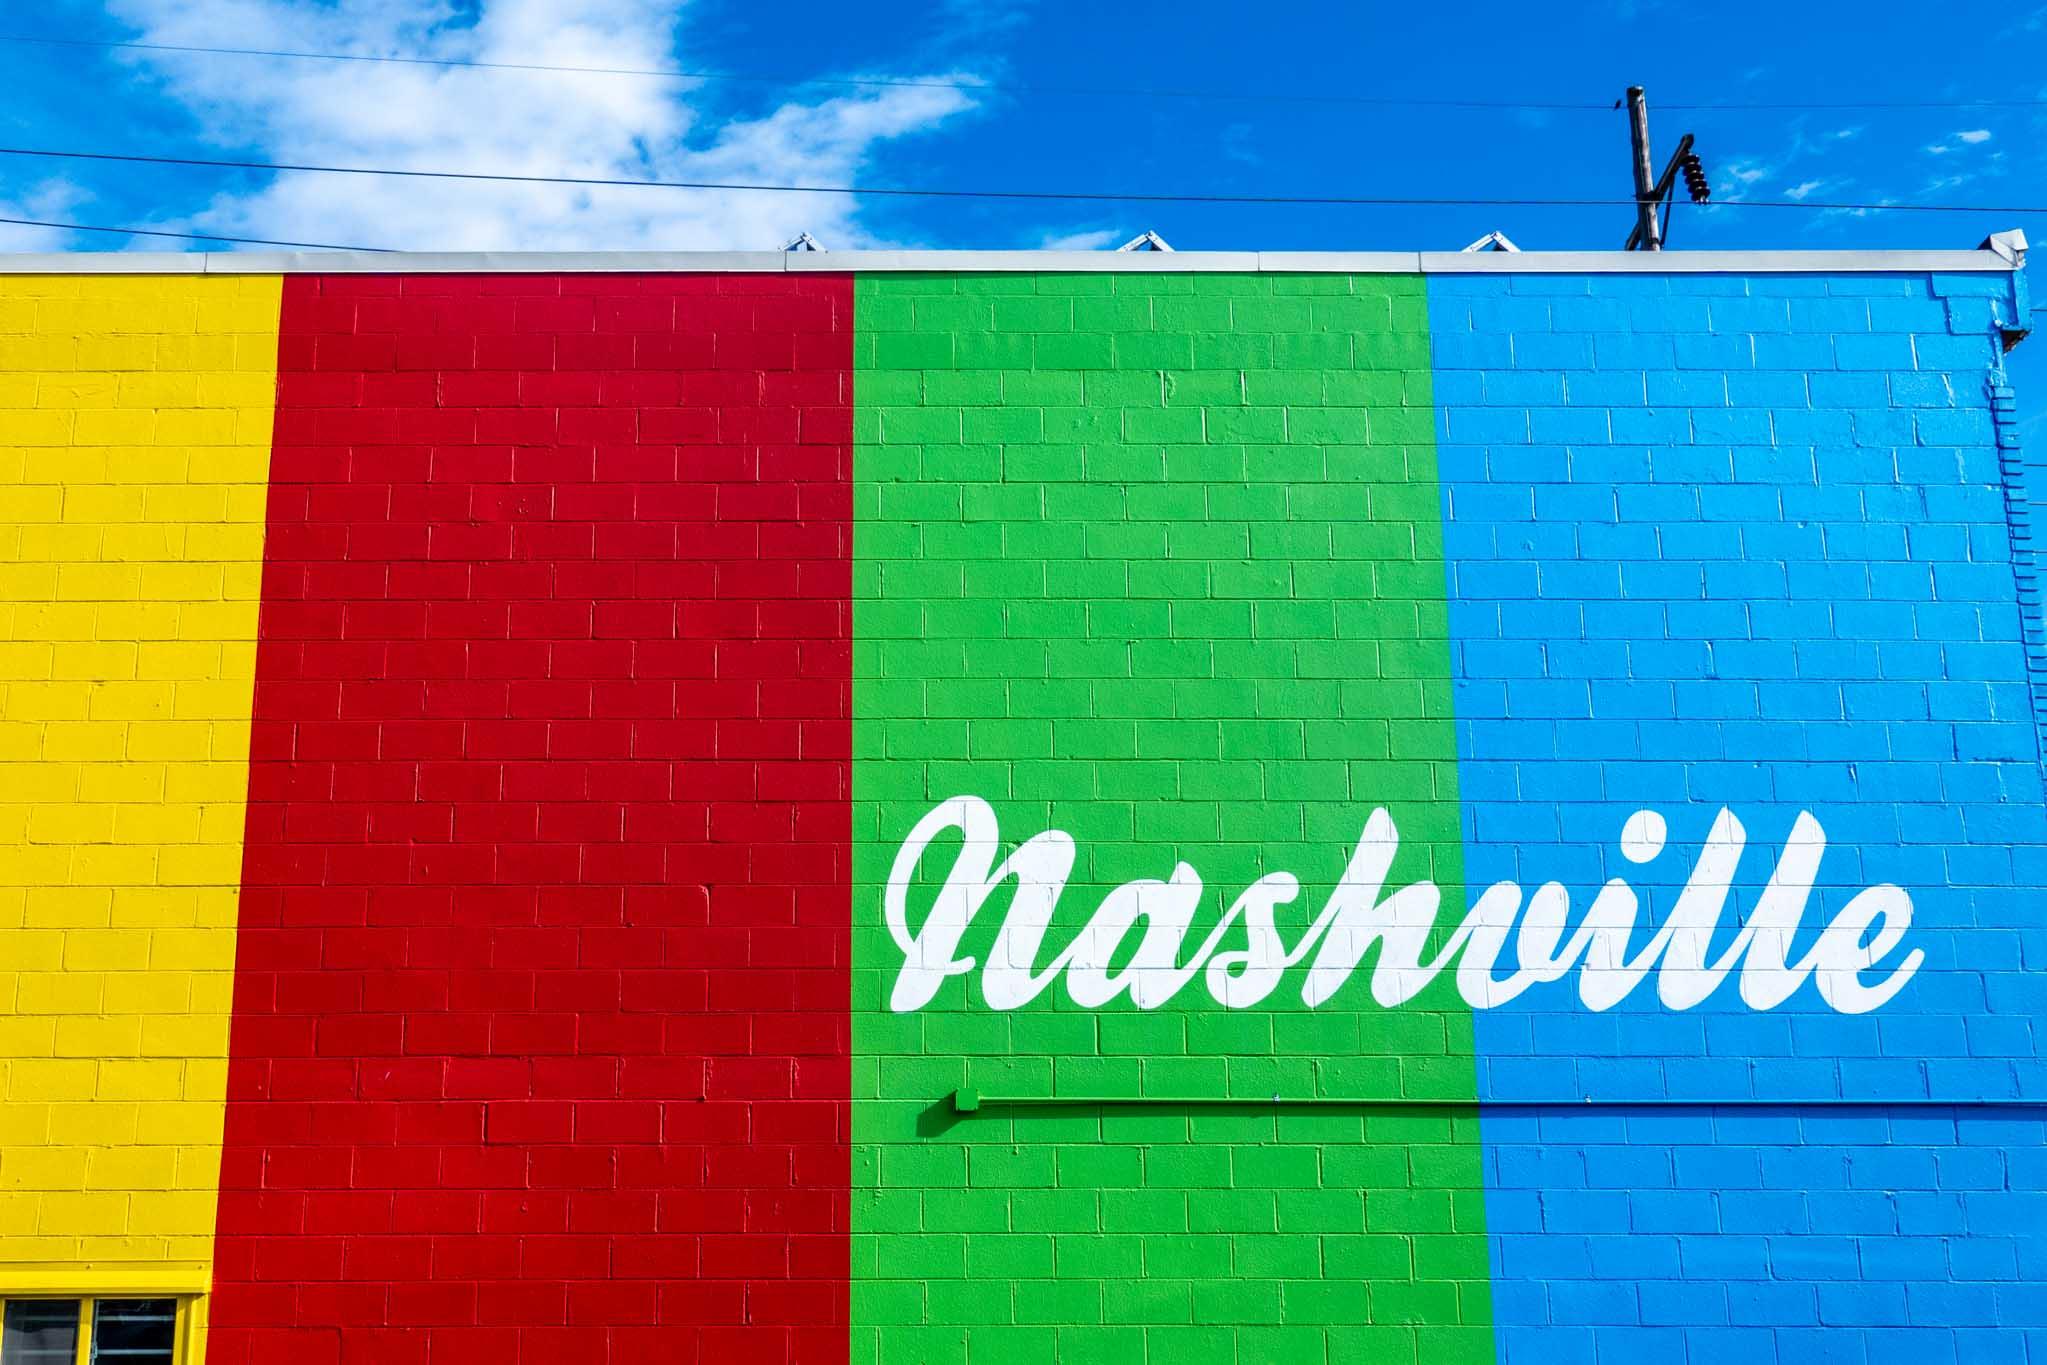 Color bar street art mural in Nashville Tennessee